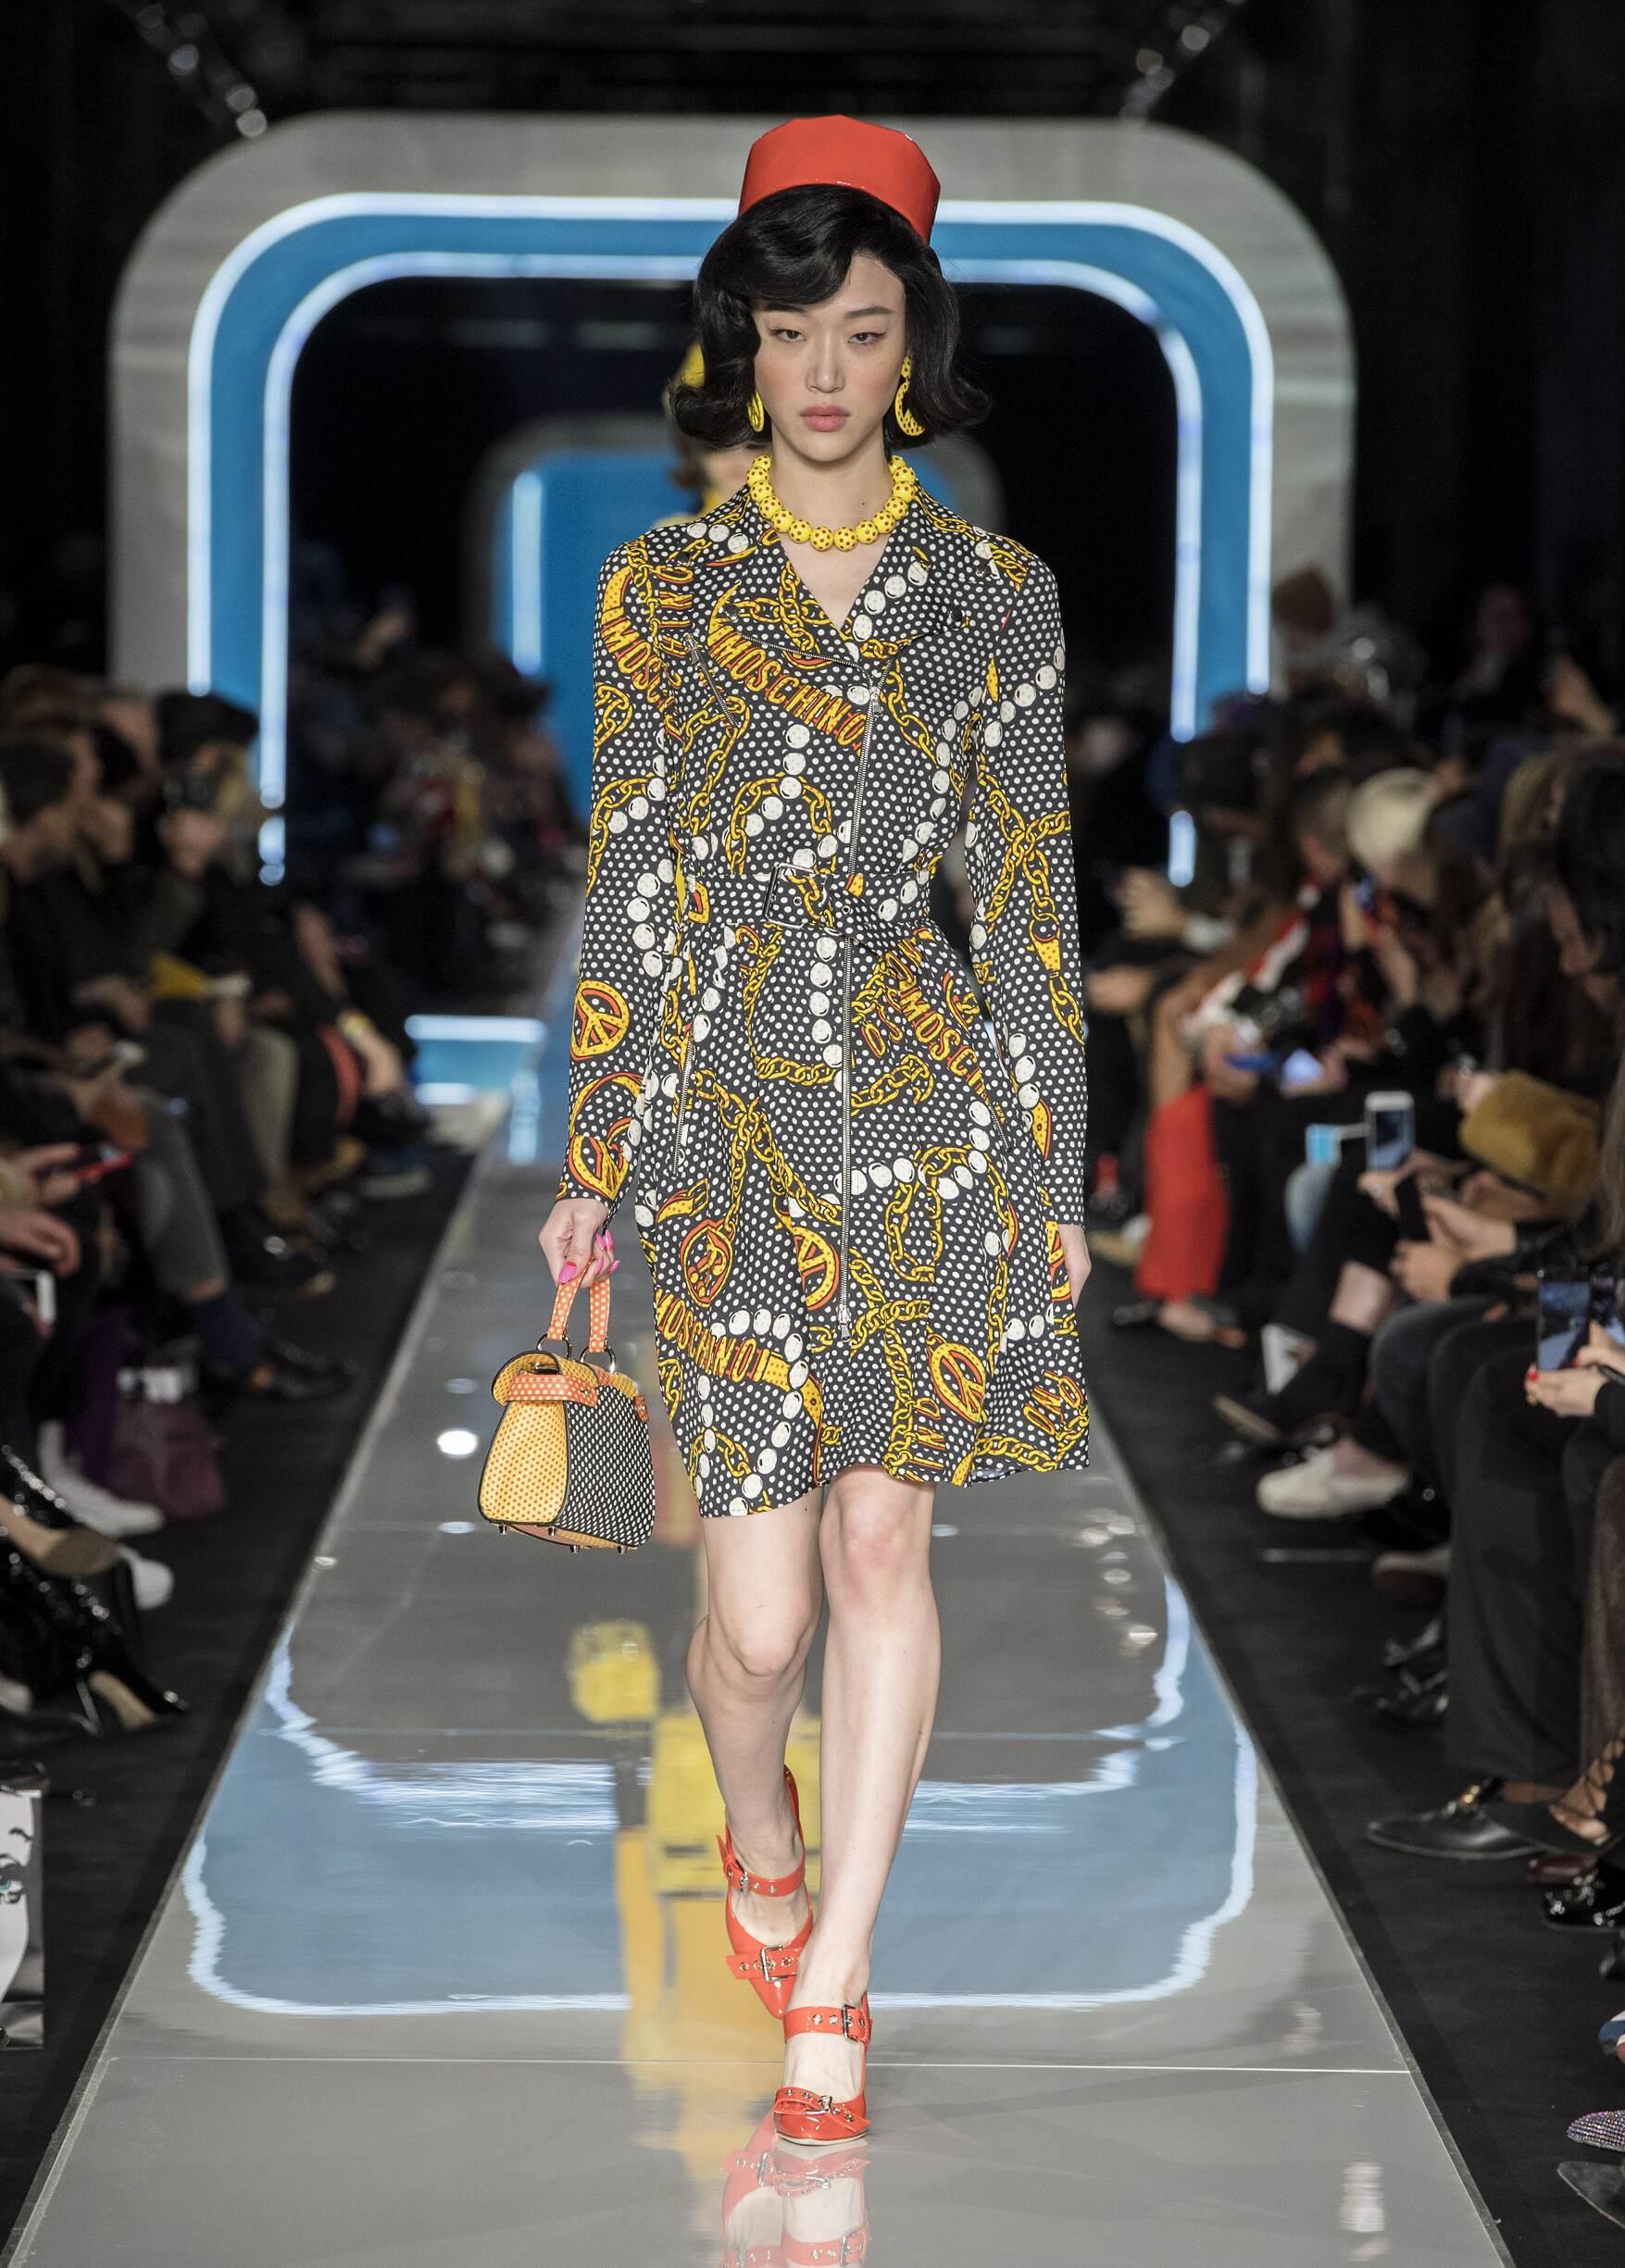 Catwalk Moschino Woman Fashion Show Winter 2018